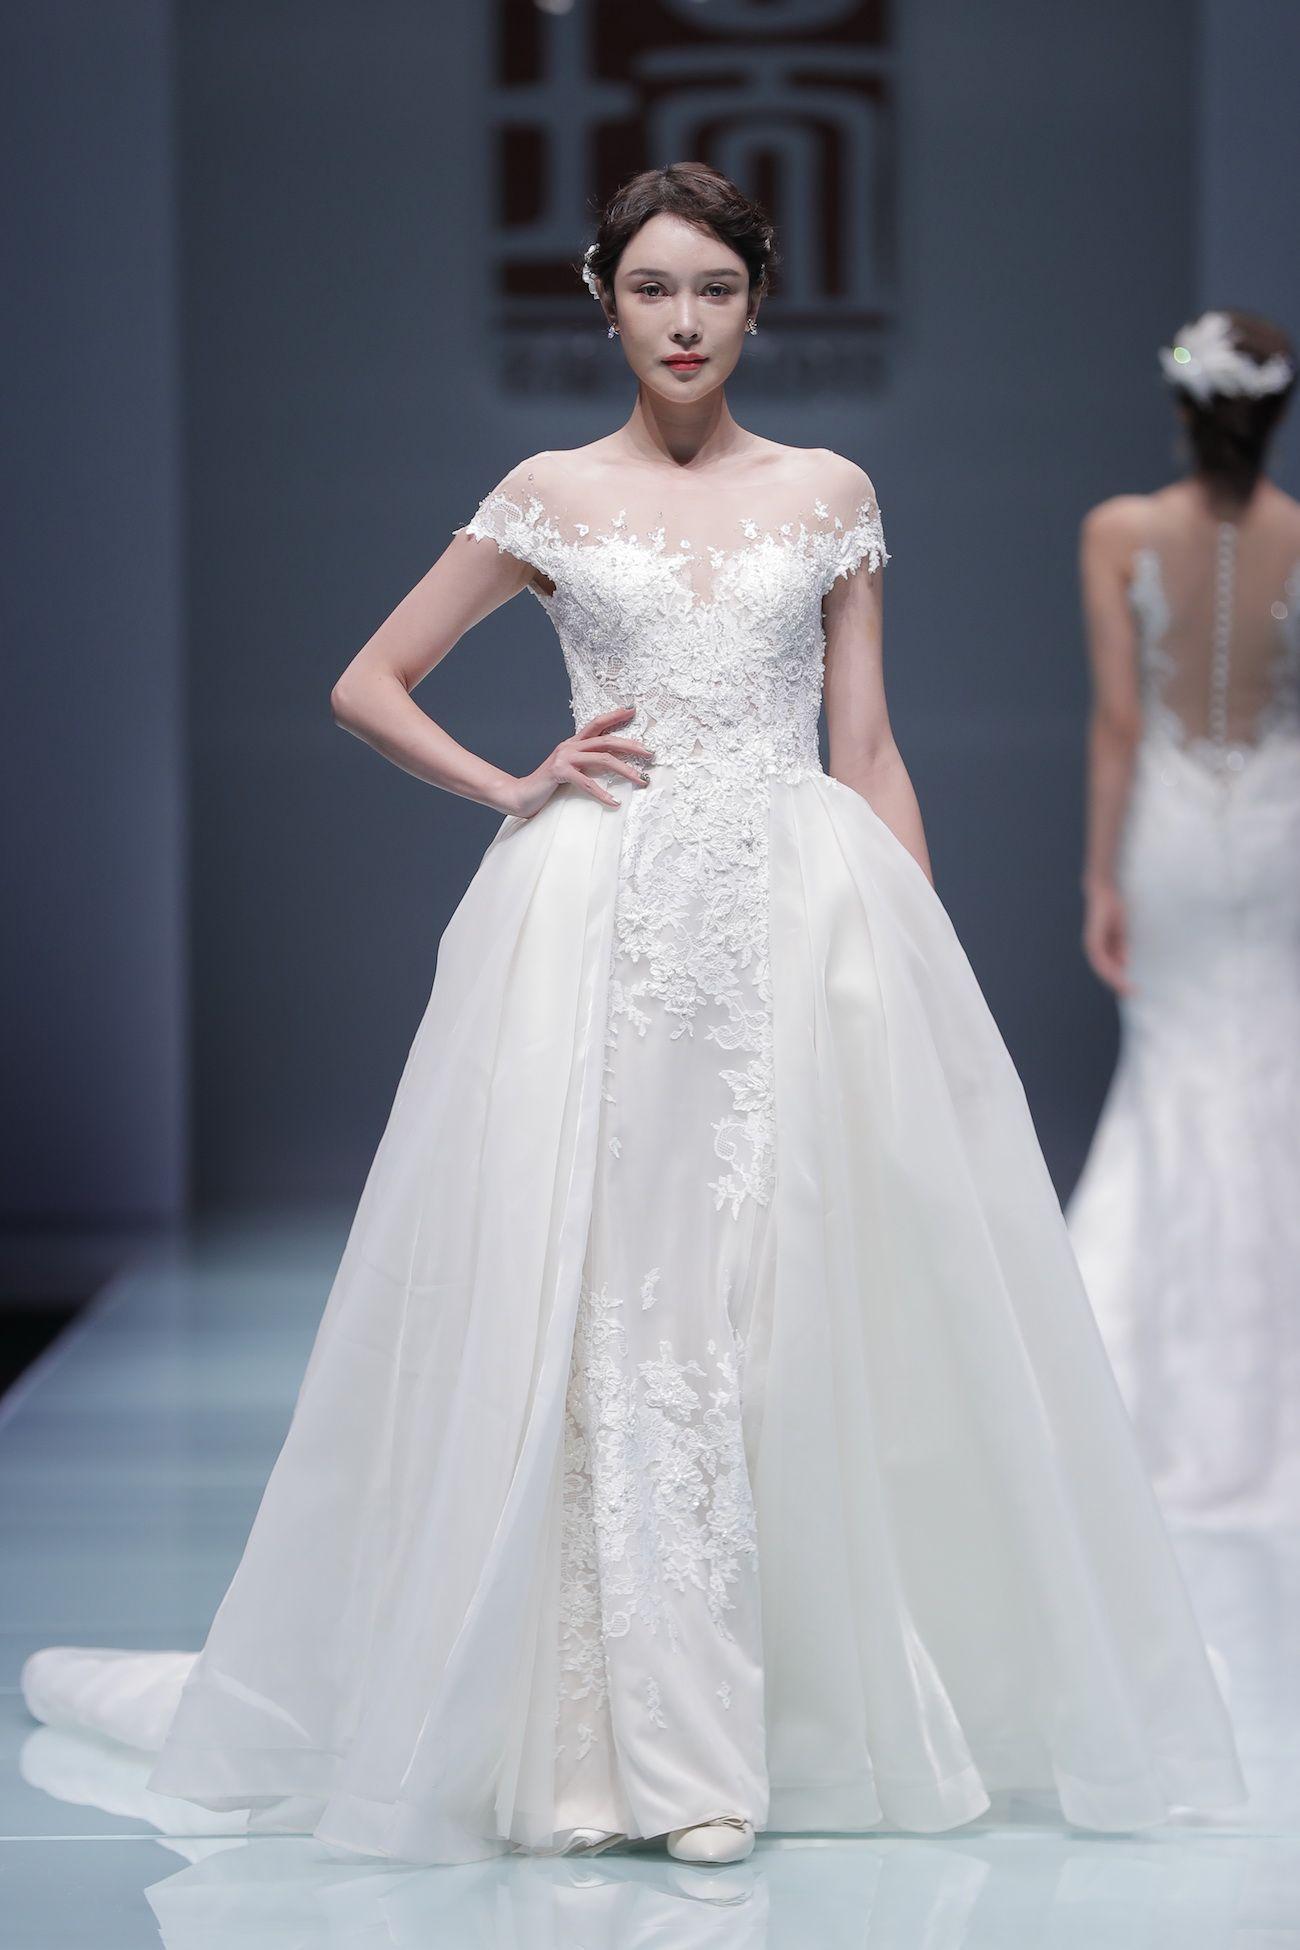 Chinese Chinese Wedding Style with Famory | WEDDING DRESSES 2017 ...